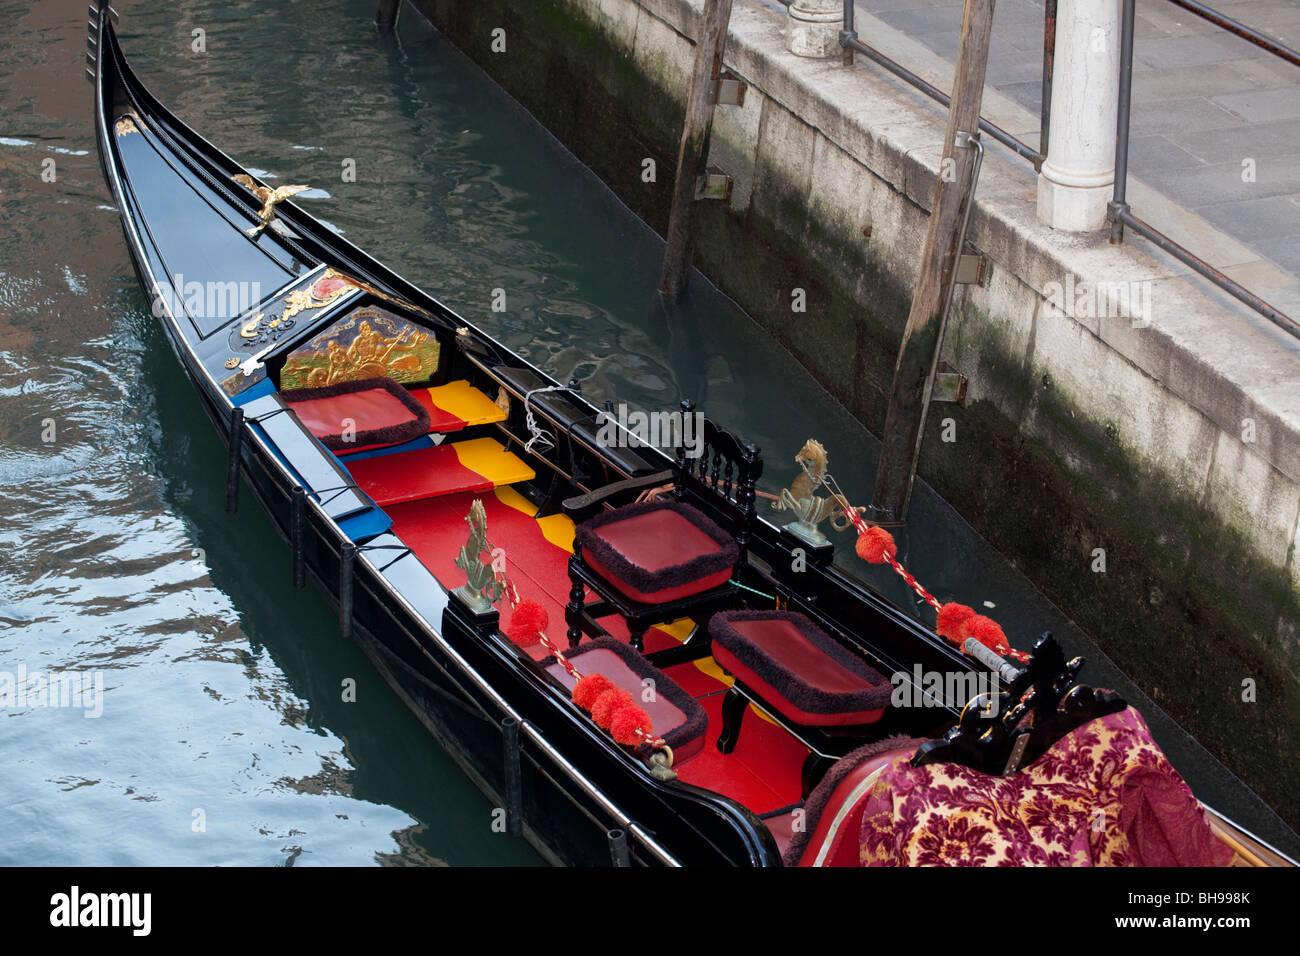 Gondola Detail Imágenes De Stock   Gondola Detail Fotos De Stock - Alamy 25f6edda30b